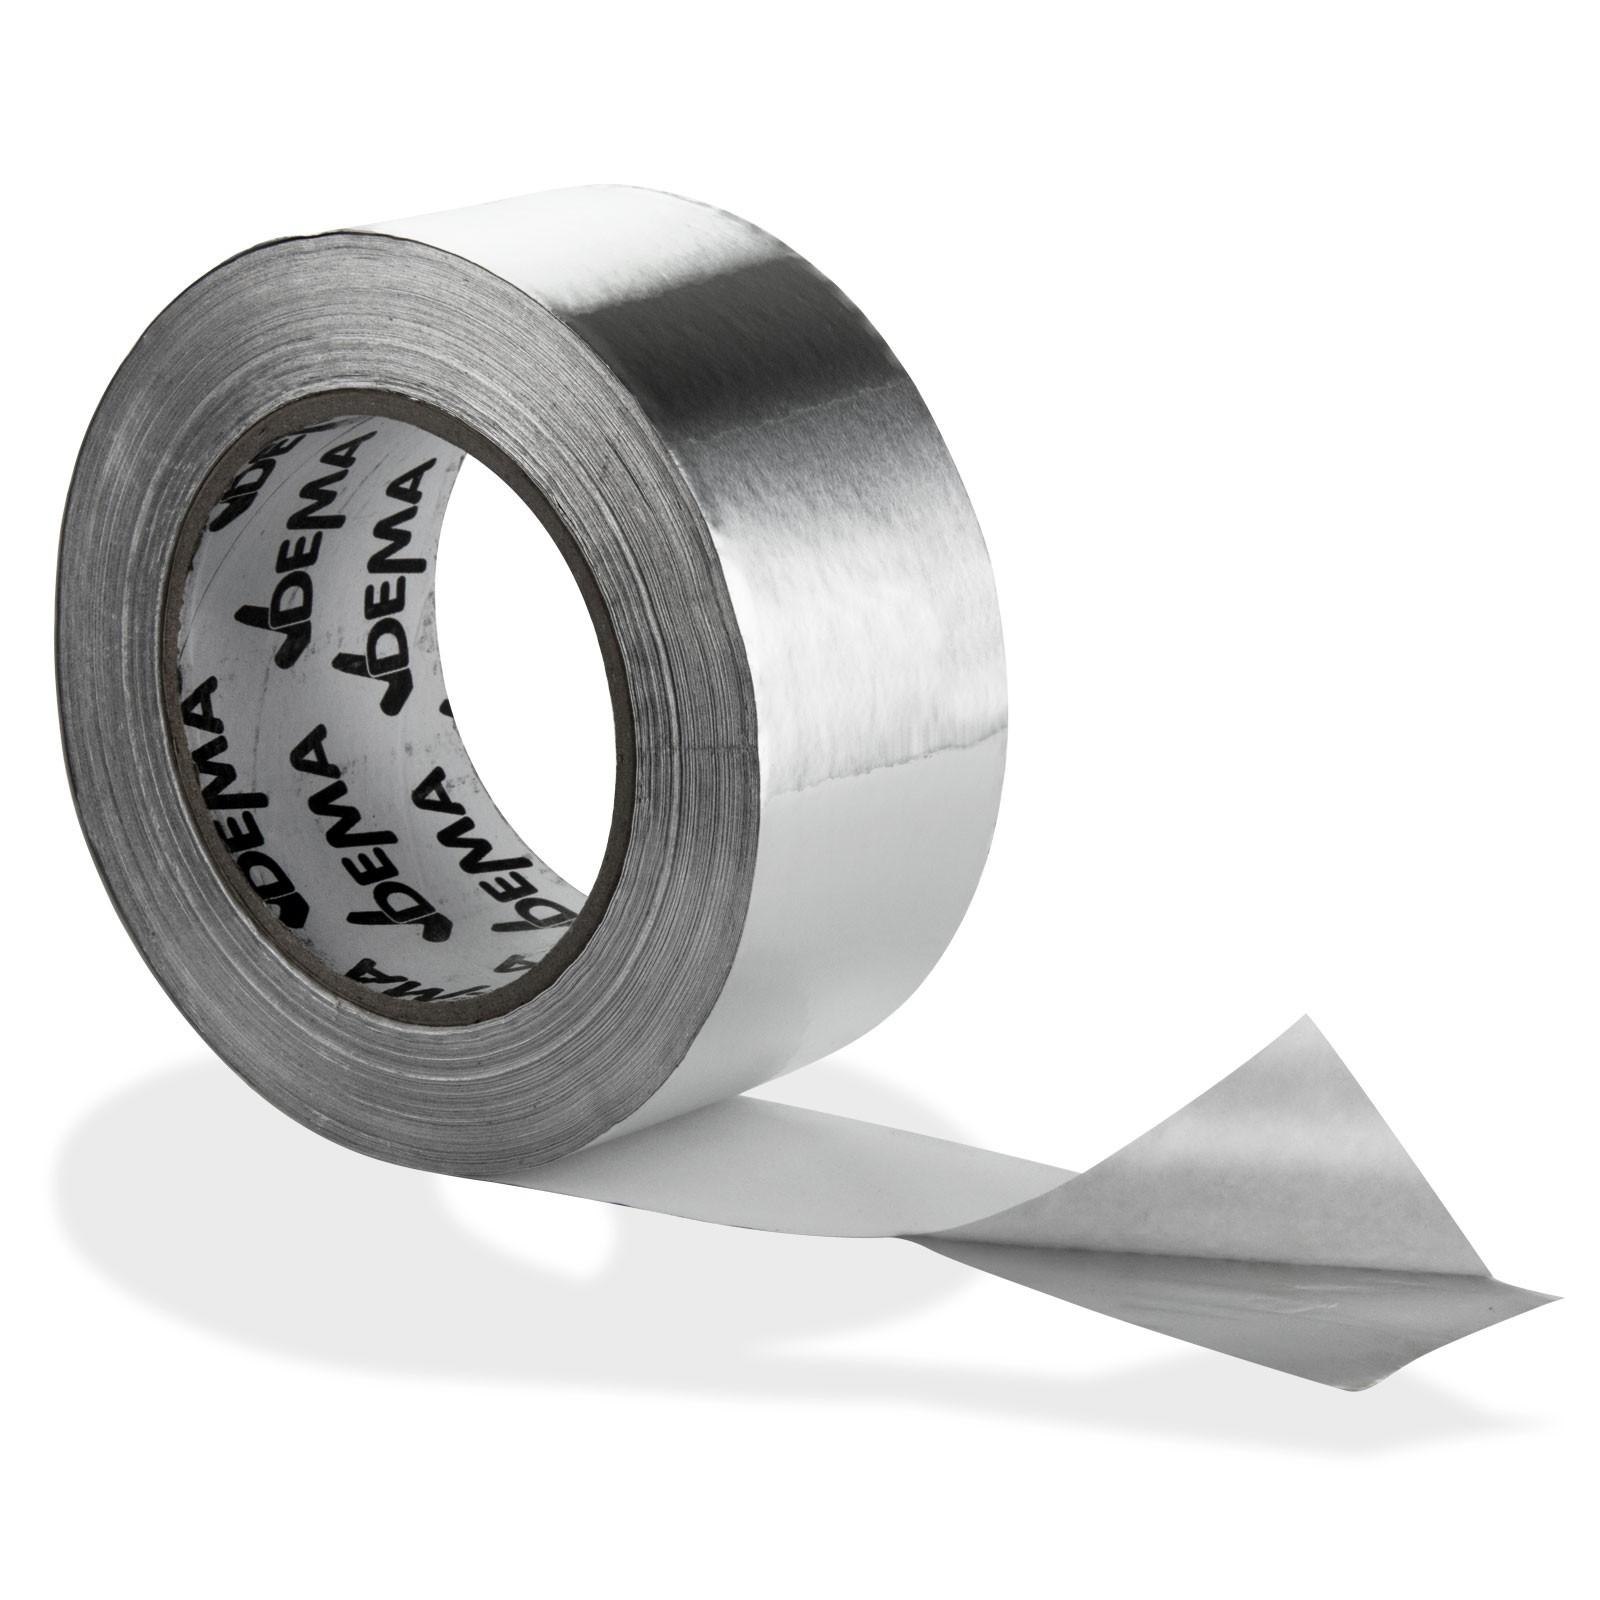 Dema Aluminium Rolle Alu Klebeband Aluband 50 mm x 50 m Band Isolierung Dampfsperre 80363